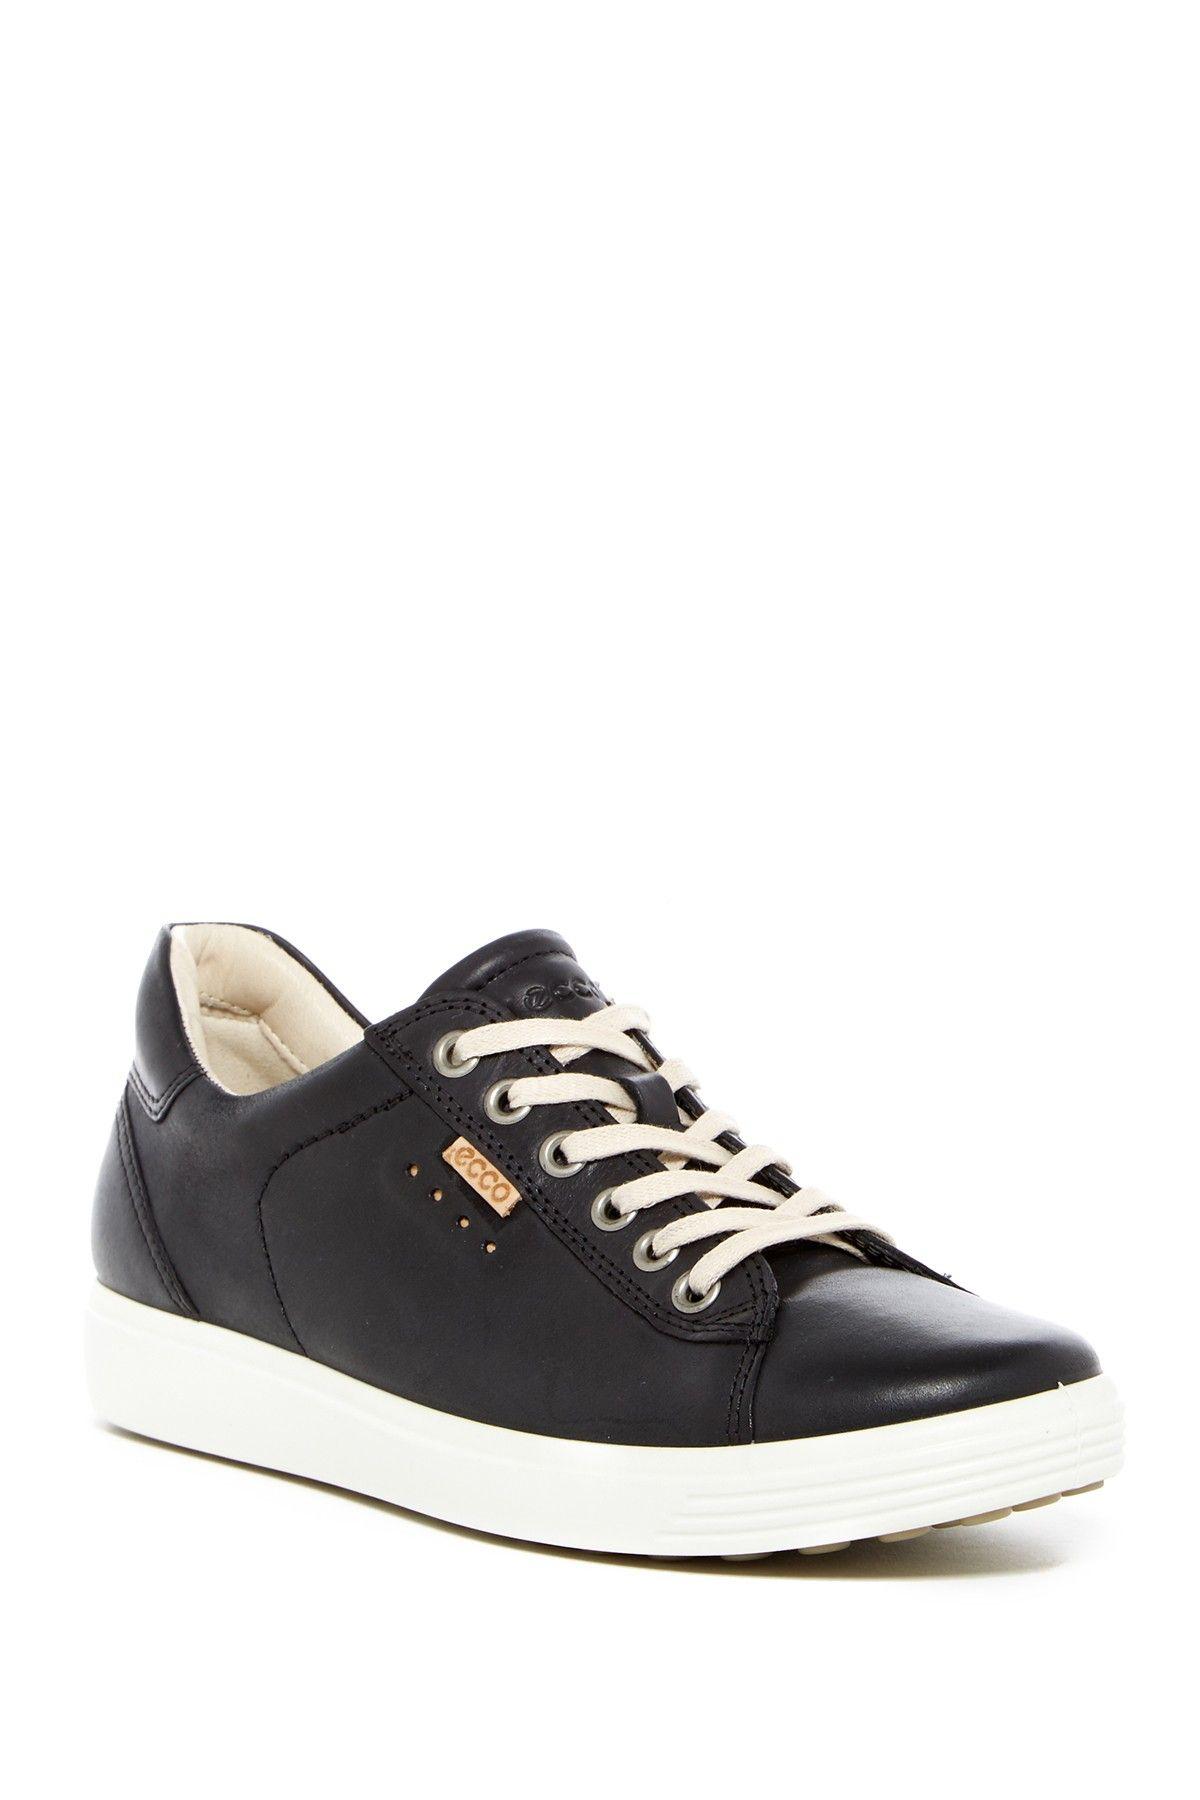 ECCO | Soft 7 Leather Sneaker